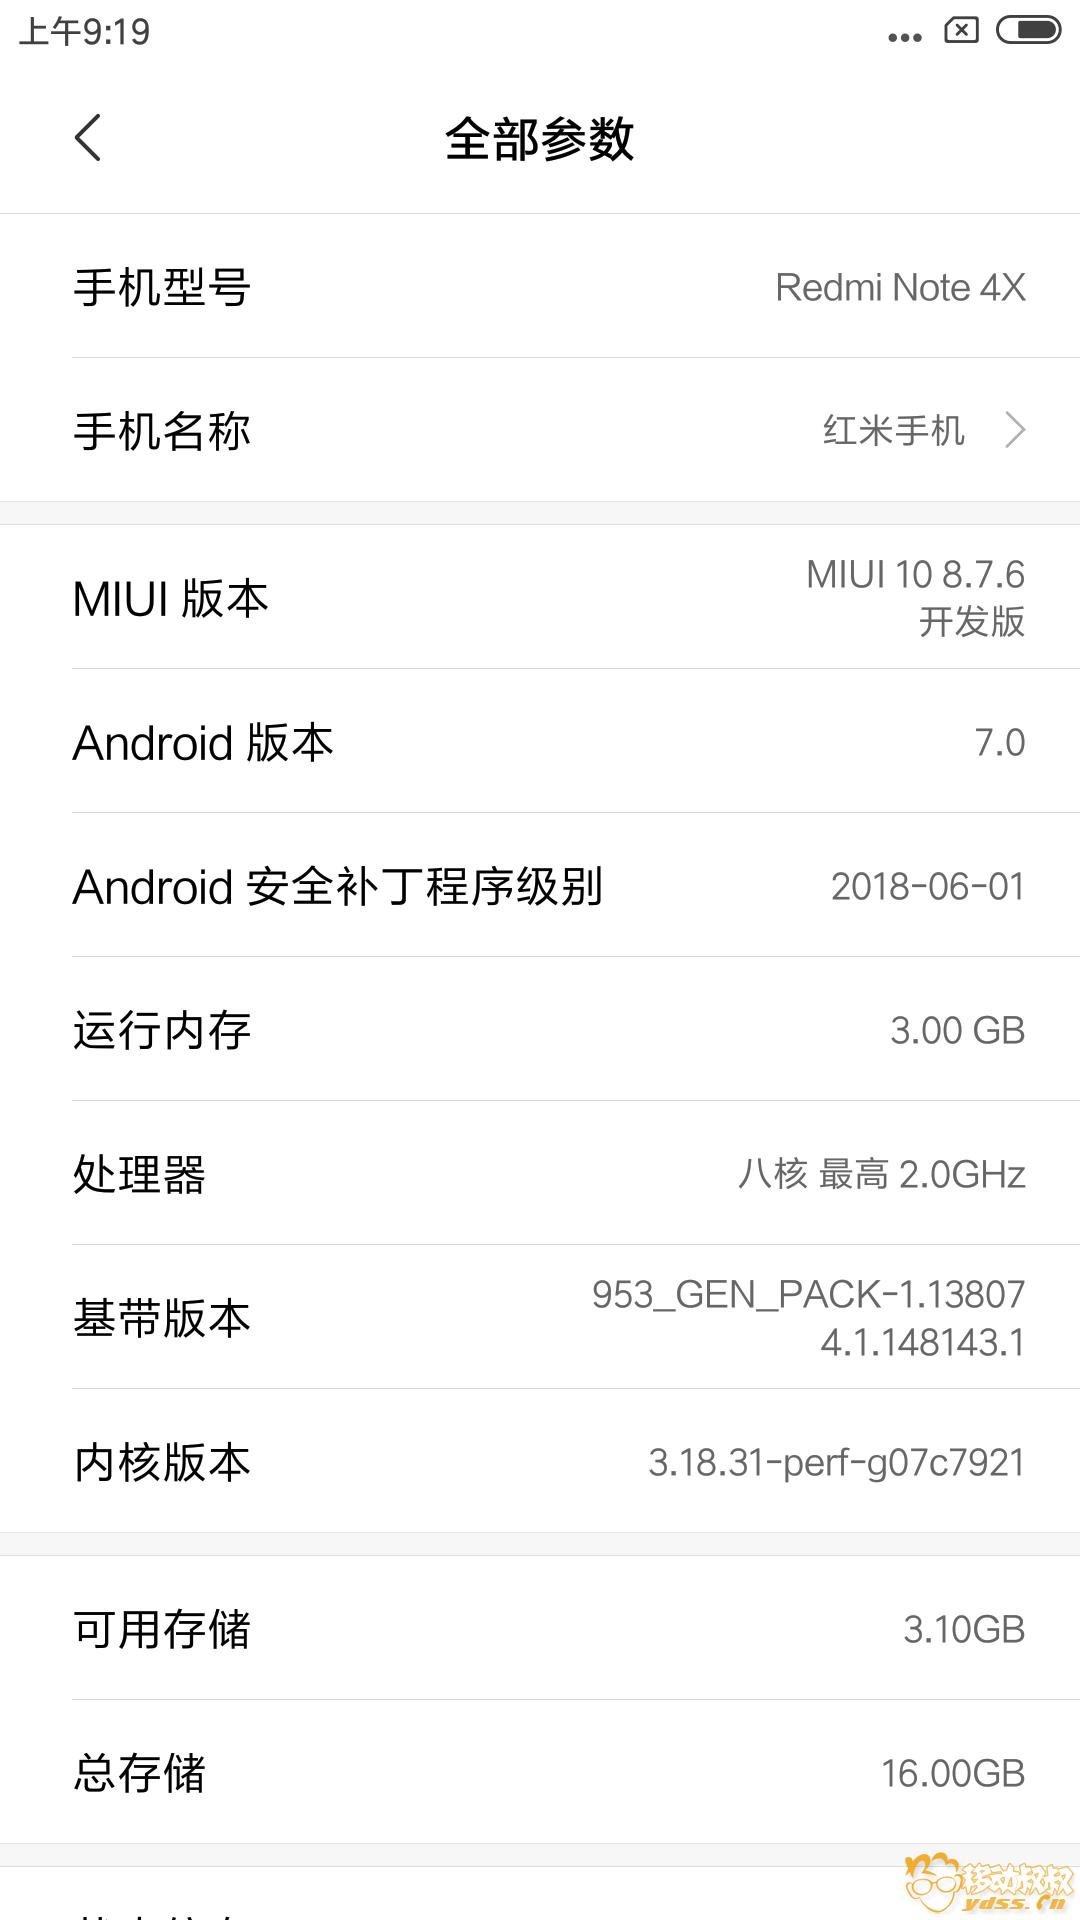 Screenshot_2018-07-06-09-19-12-605_com.android.settings.png